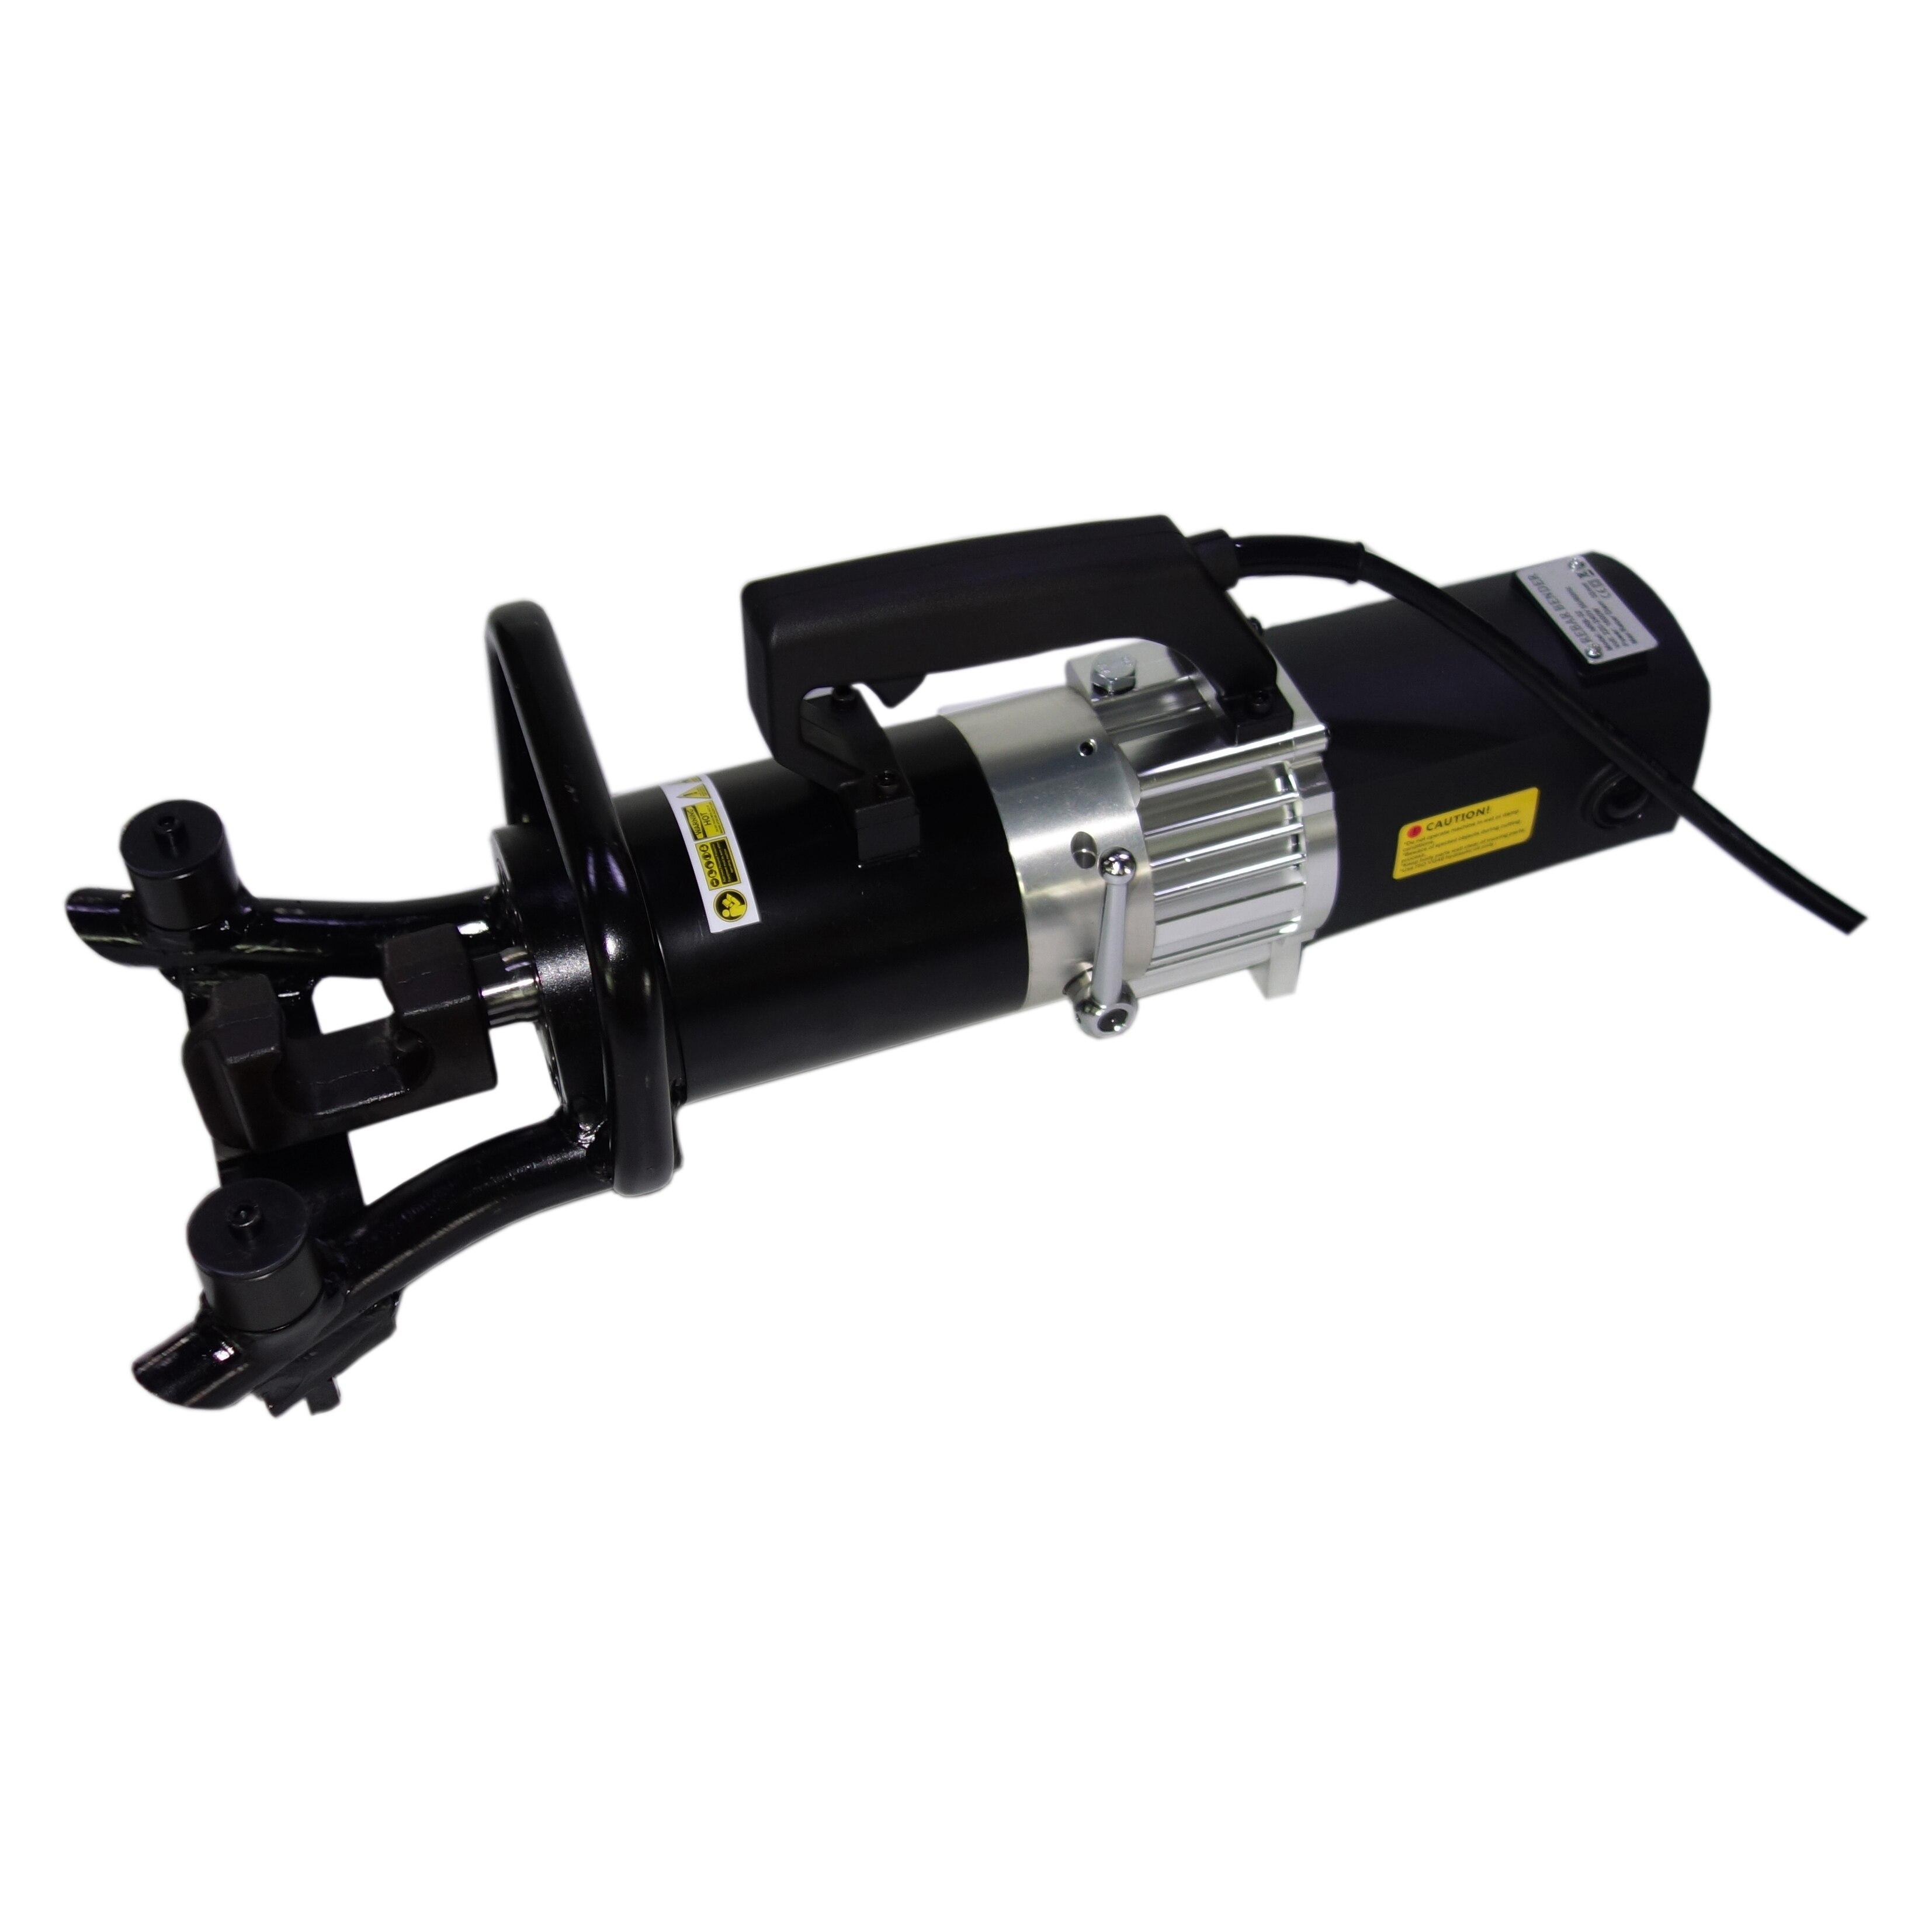 Electric Hydraulic Rebar Bender For Max 32mm NRB-32 Steel Bar Bending Machine Hydraulic